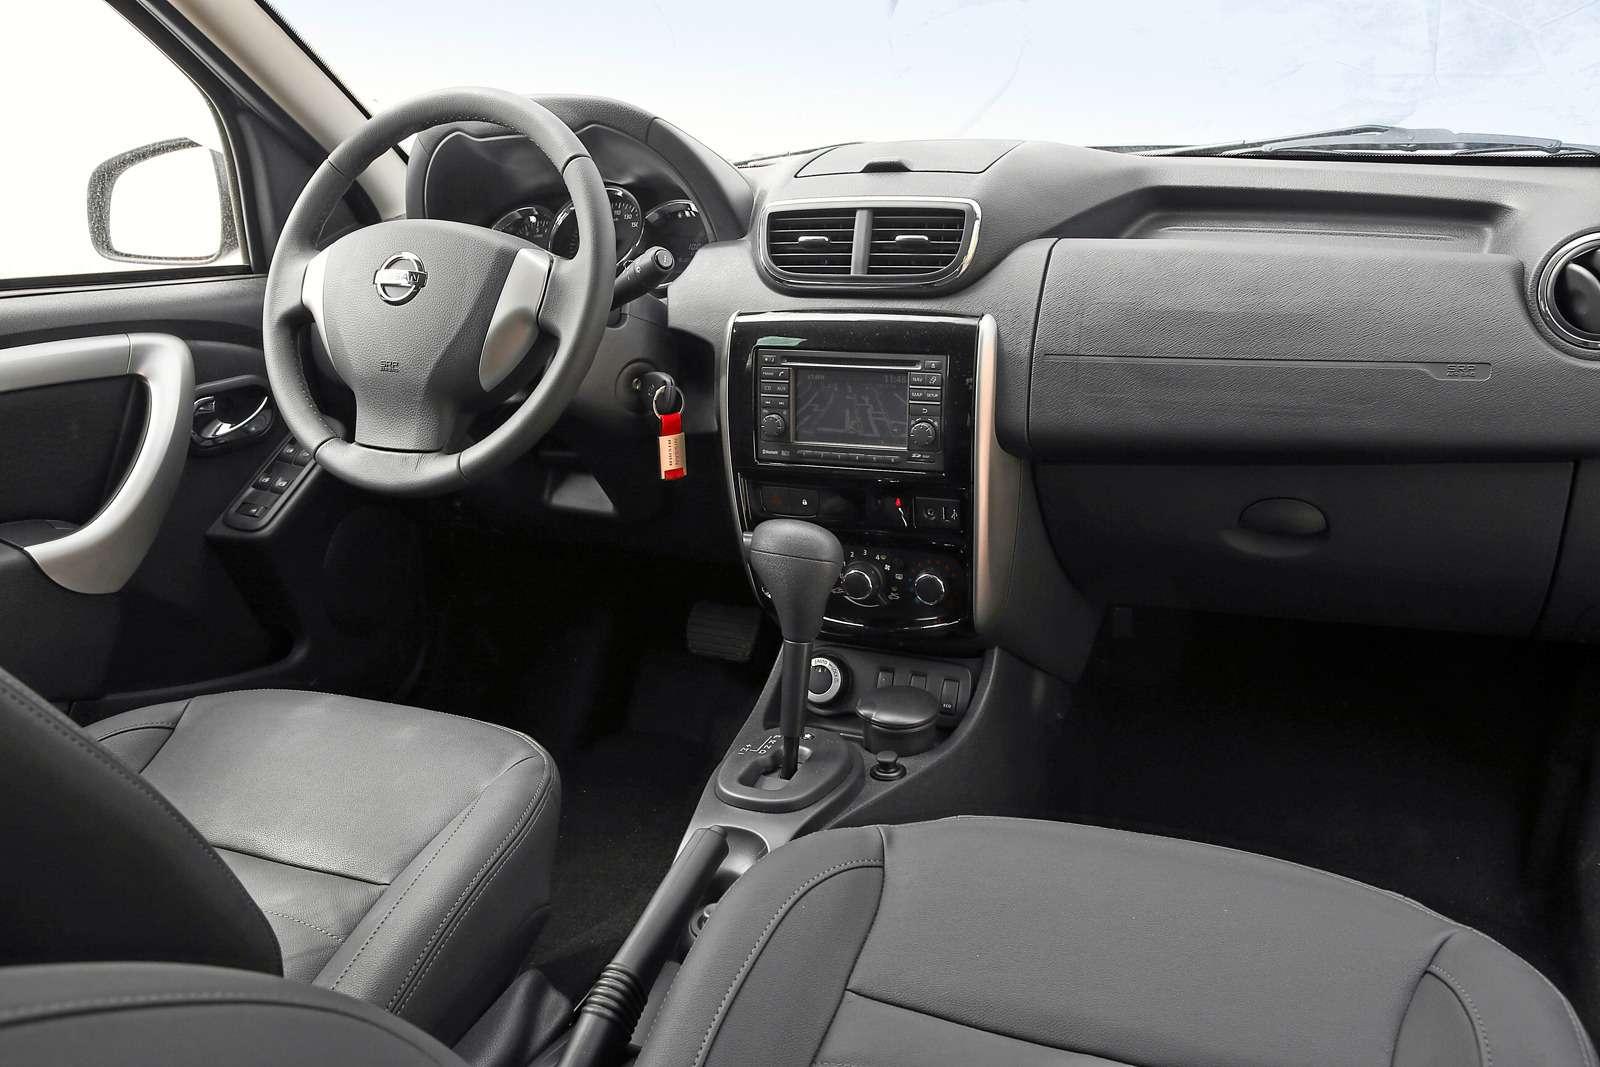 Nissan Terrano сновыми моторами: эко-невидаль— фото 592832